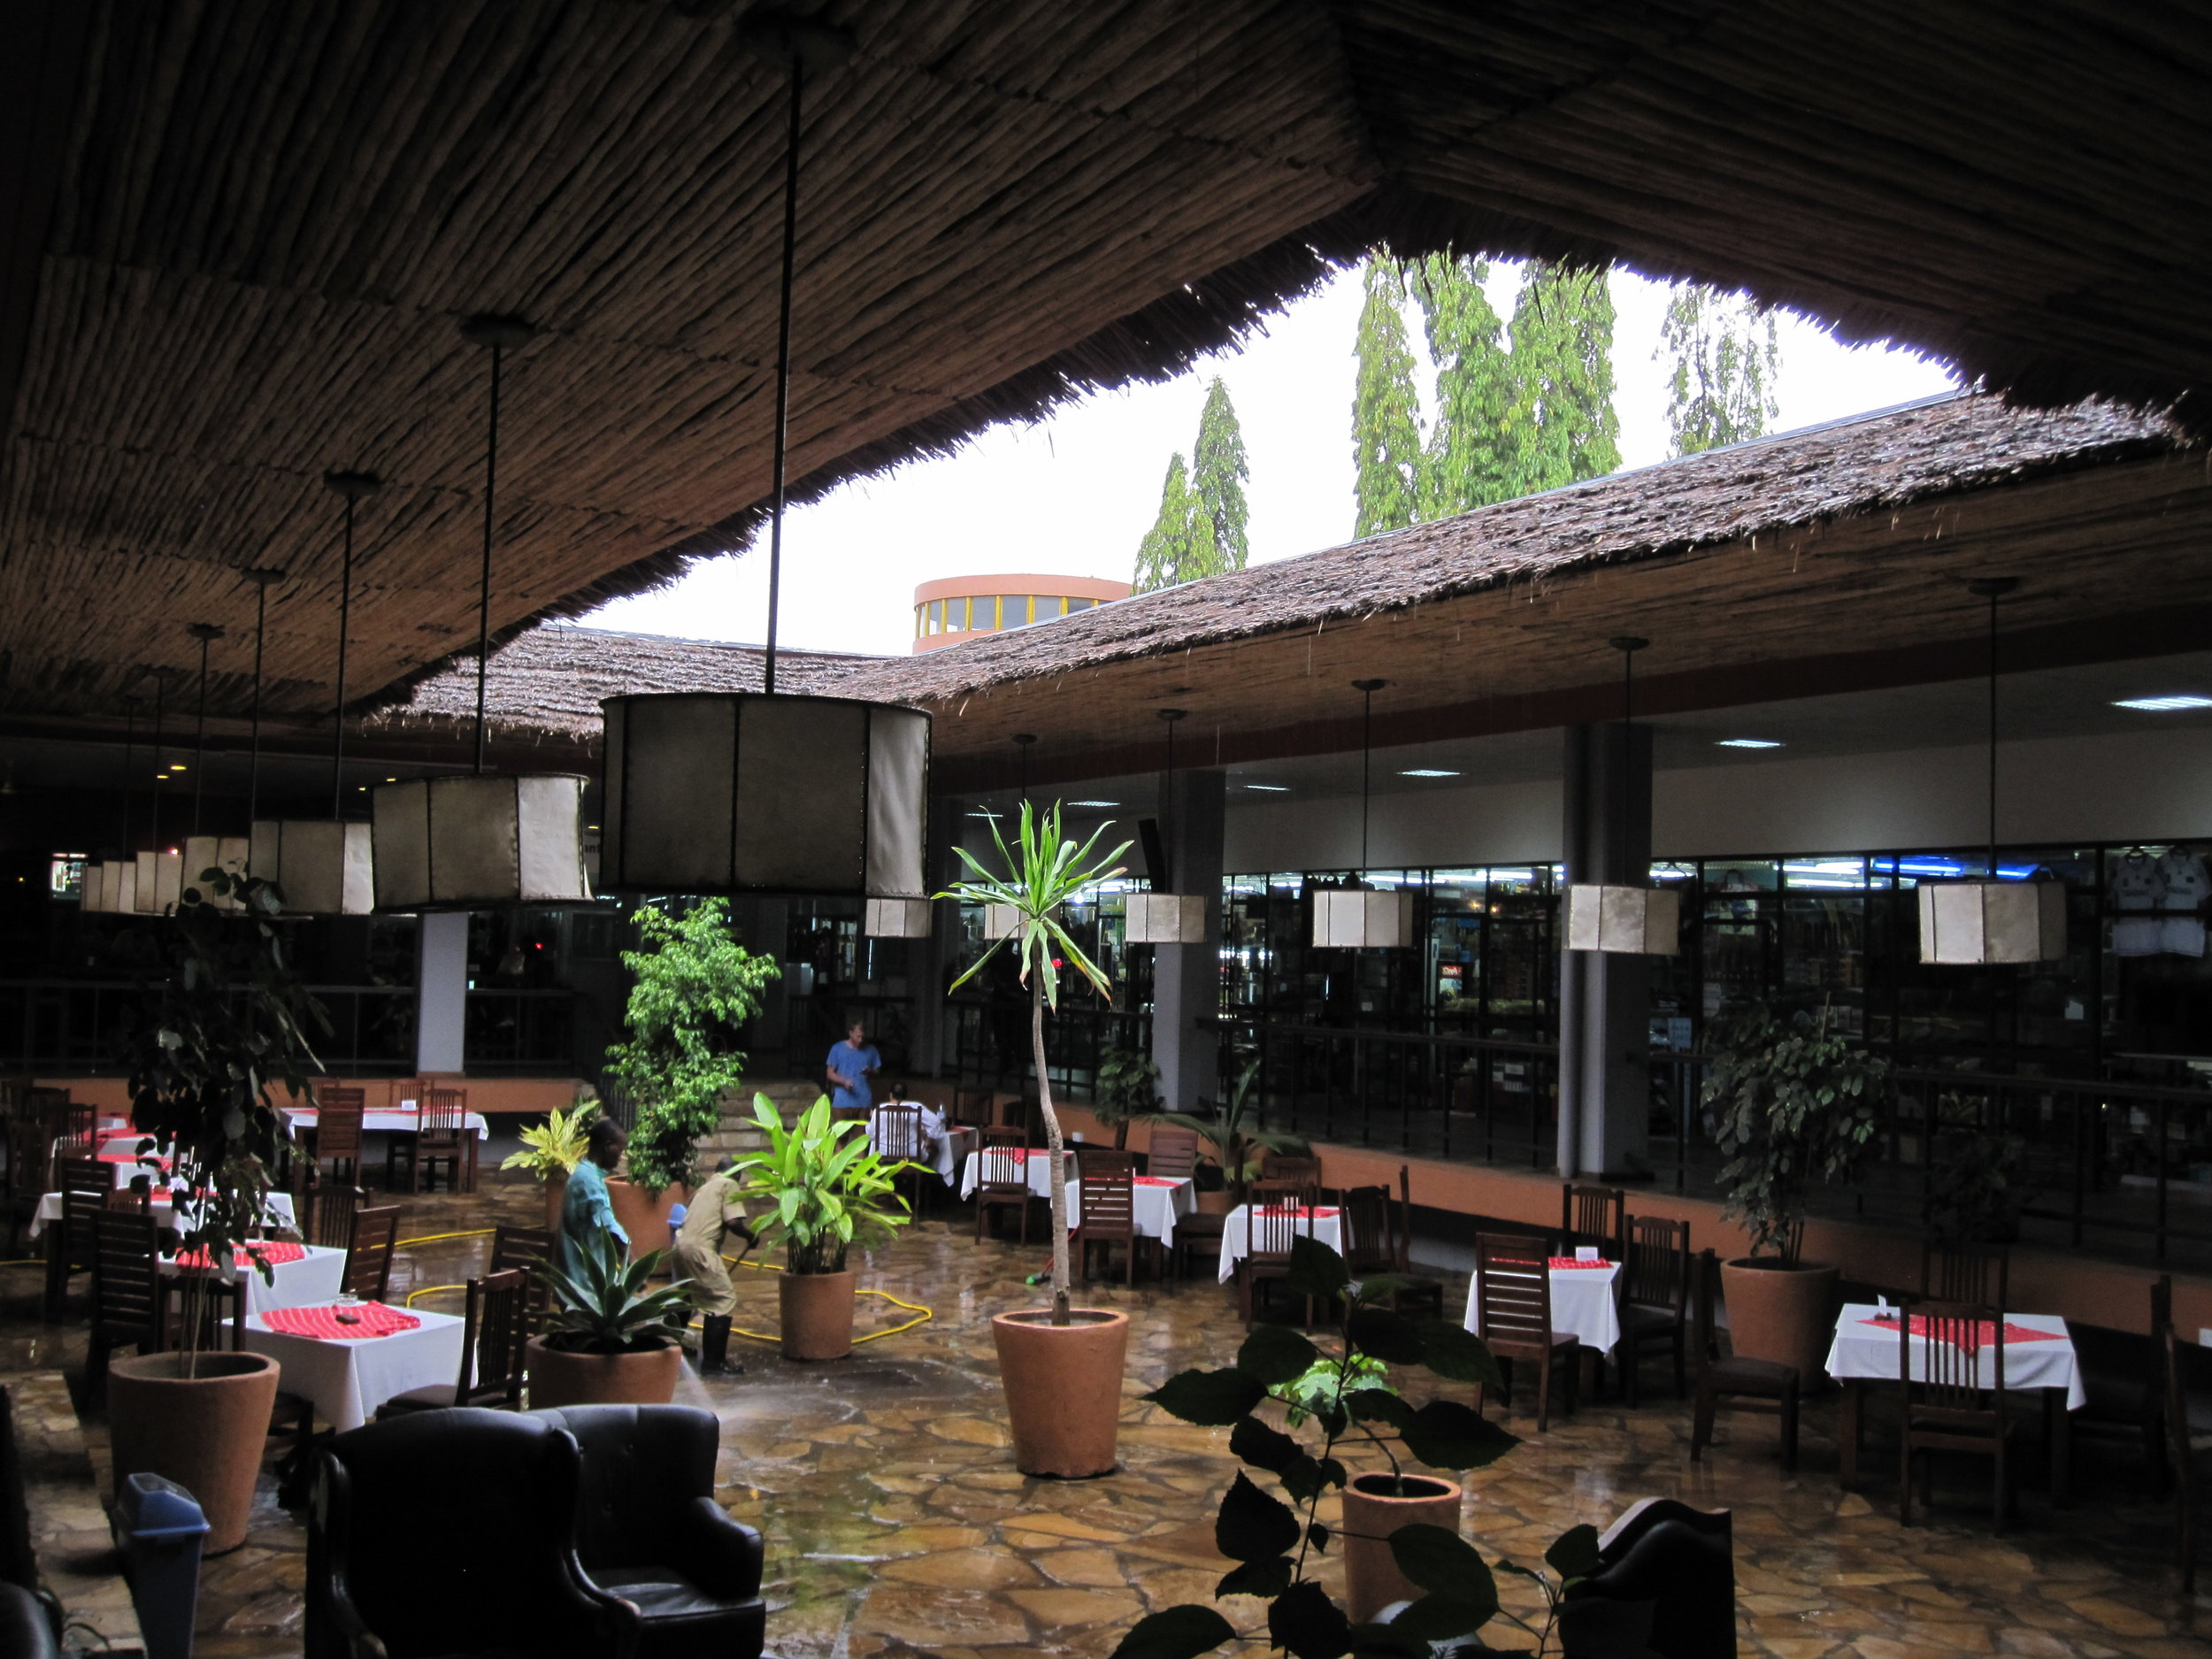 Open eating area at Kilimanjaro International Airport